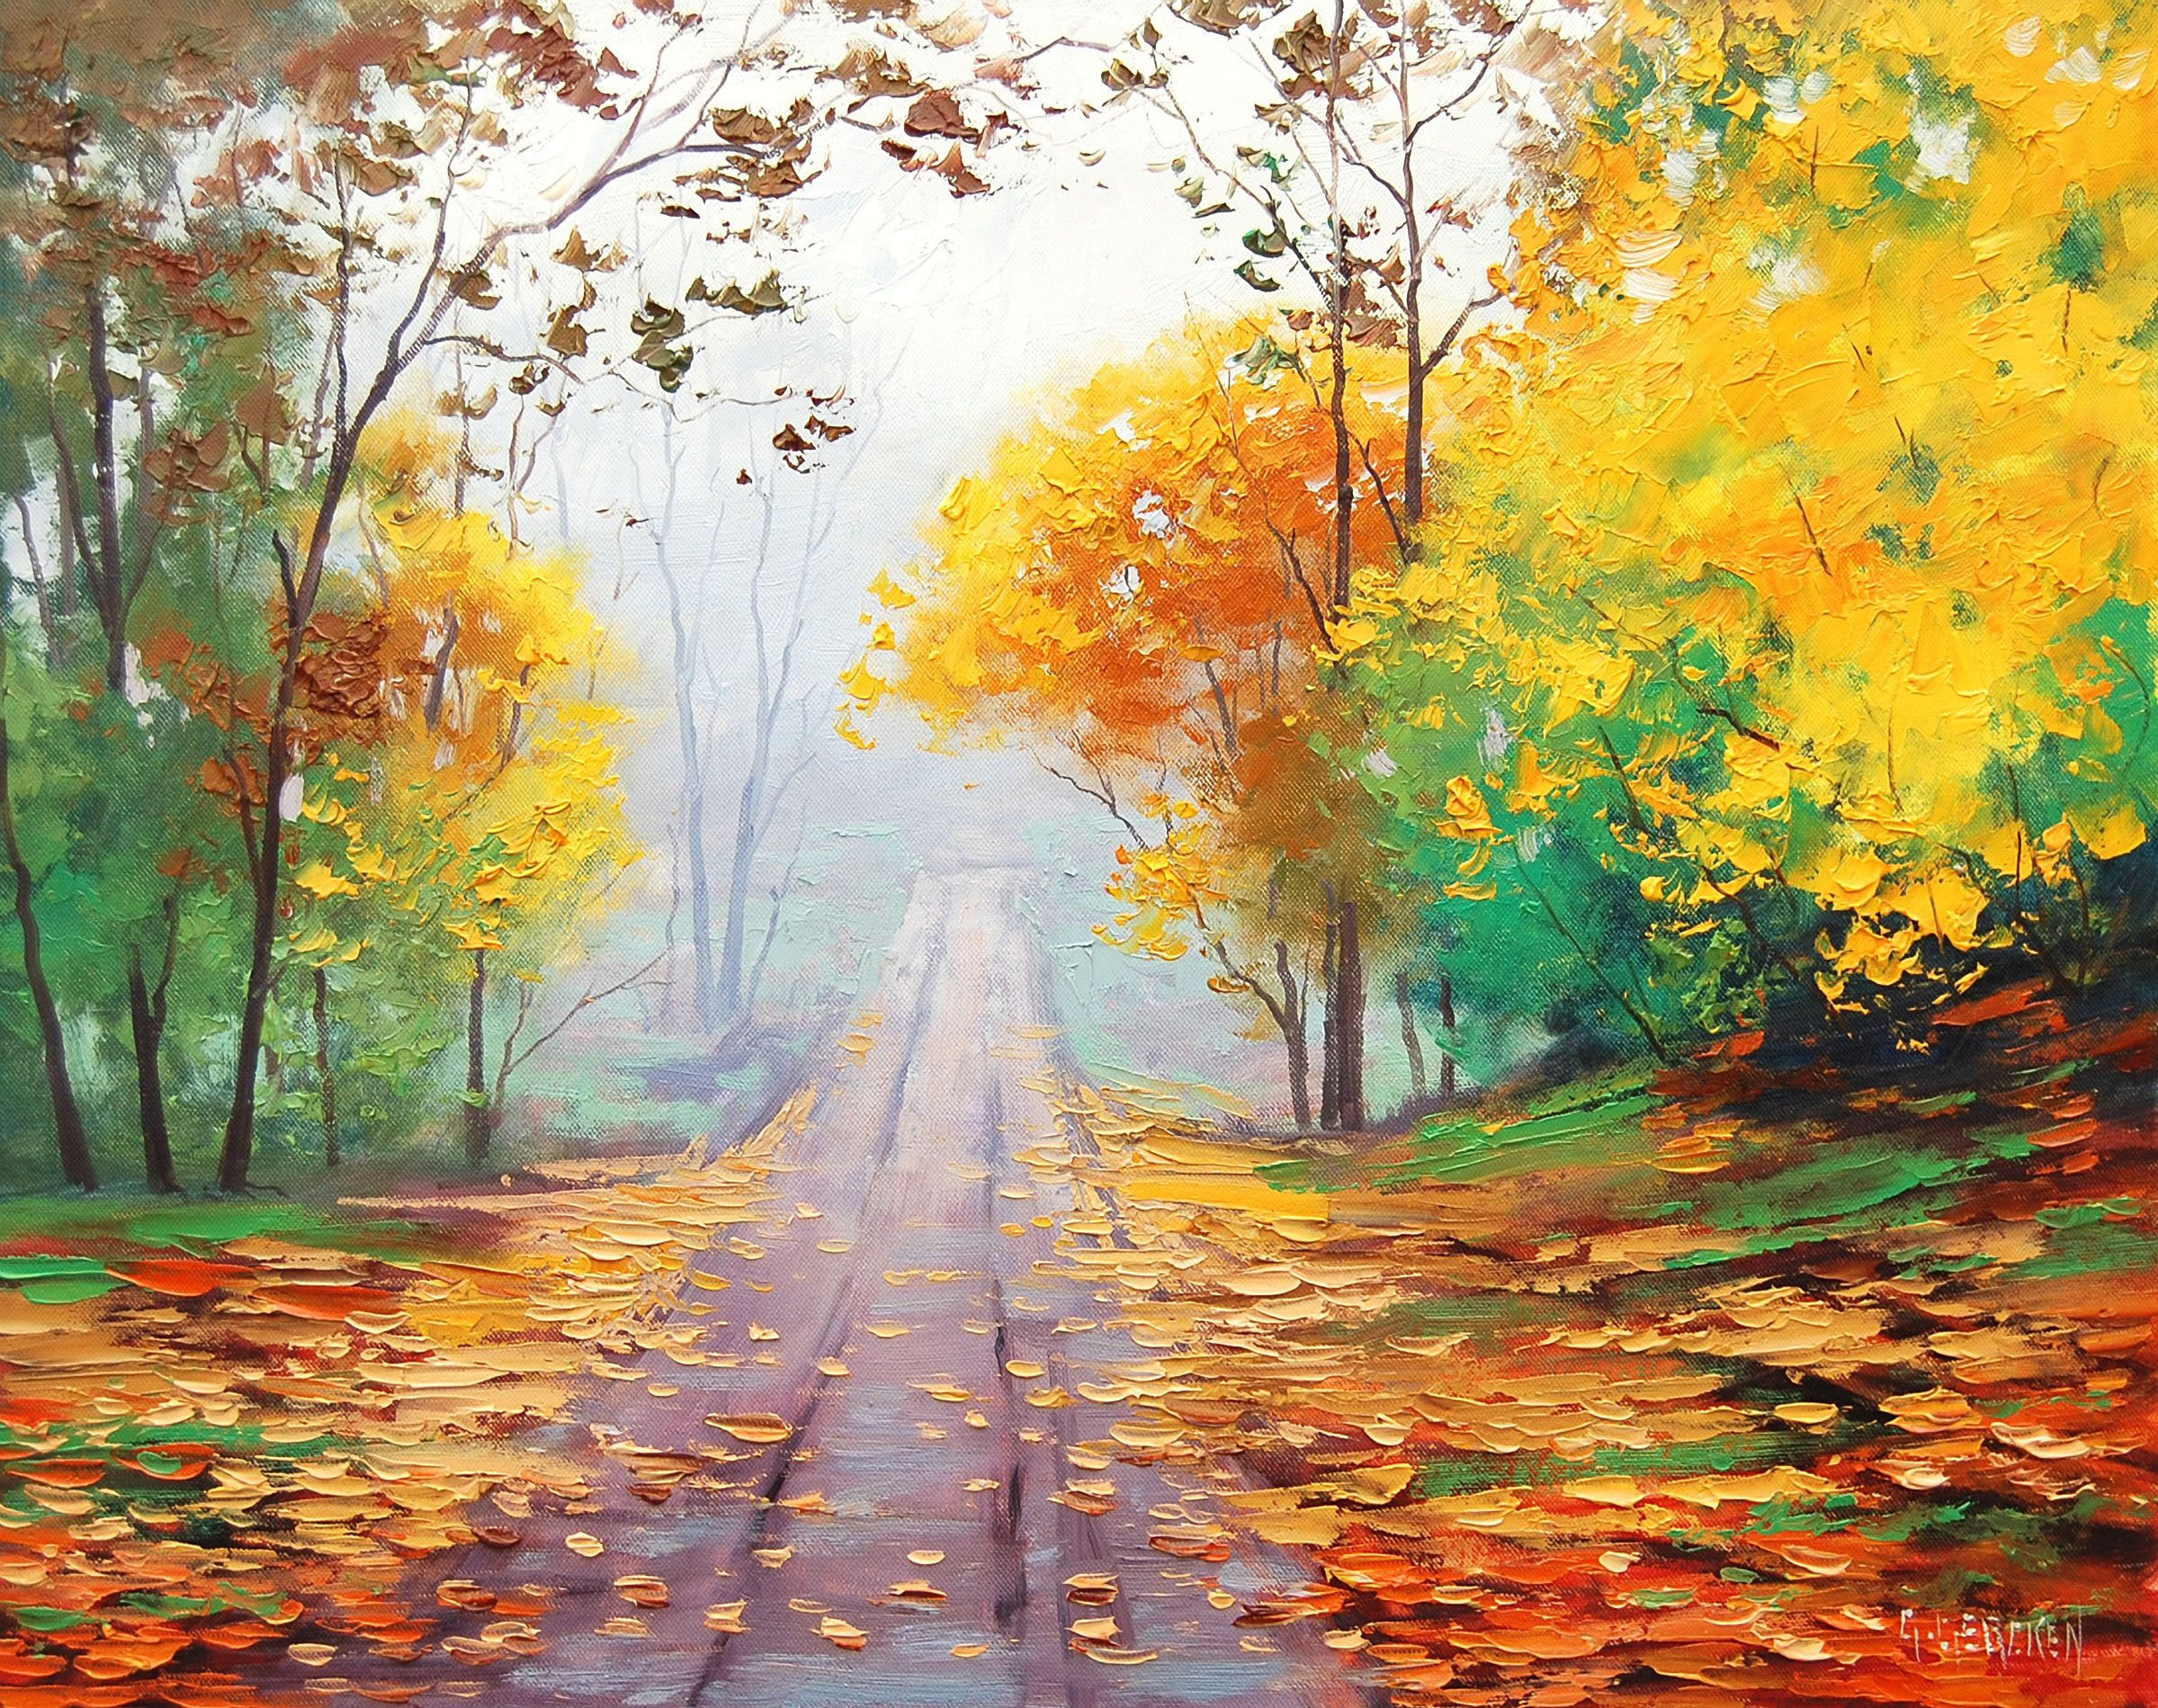 Oil Painting Desktop Wallpaper